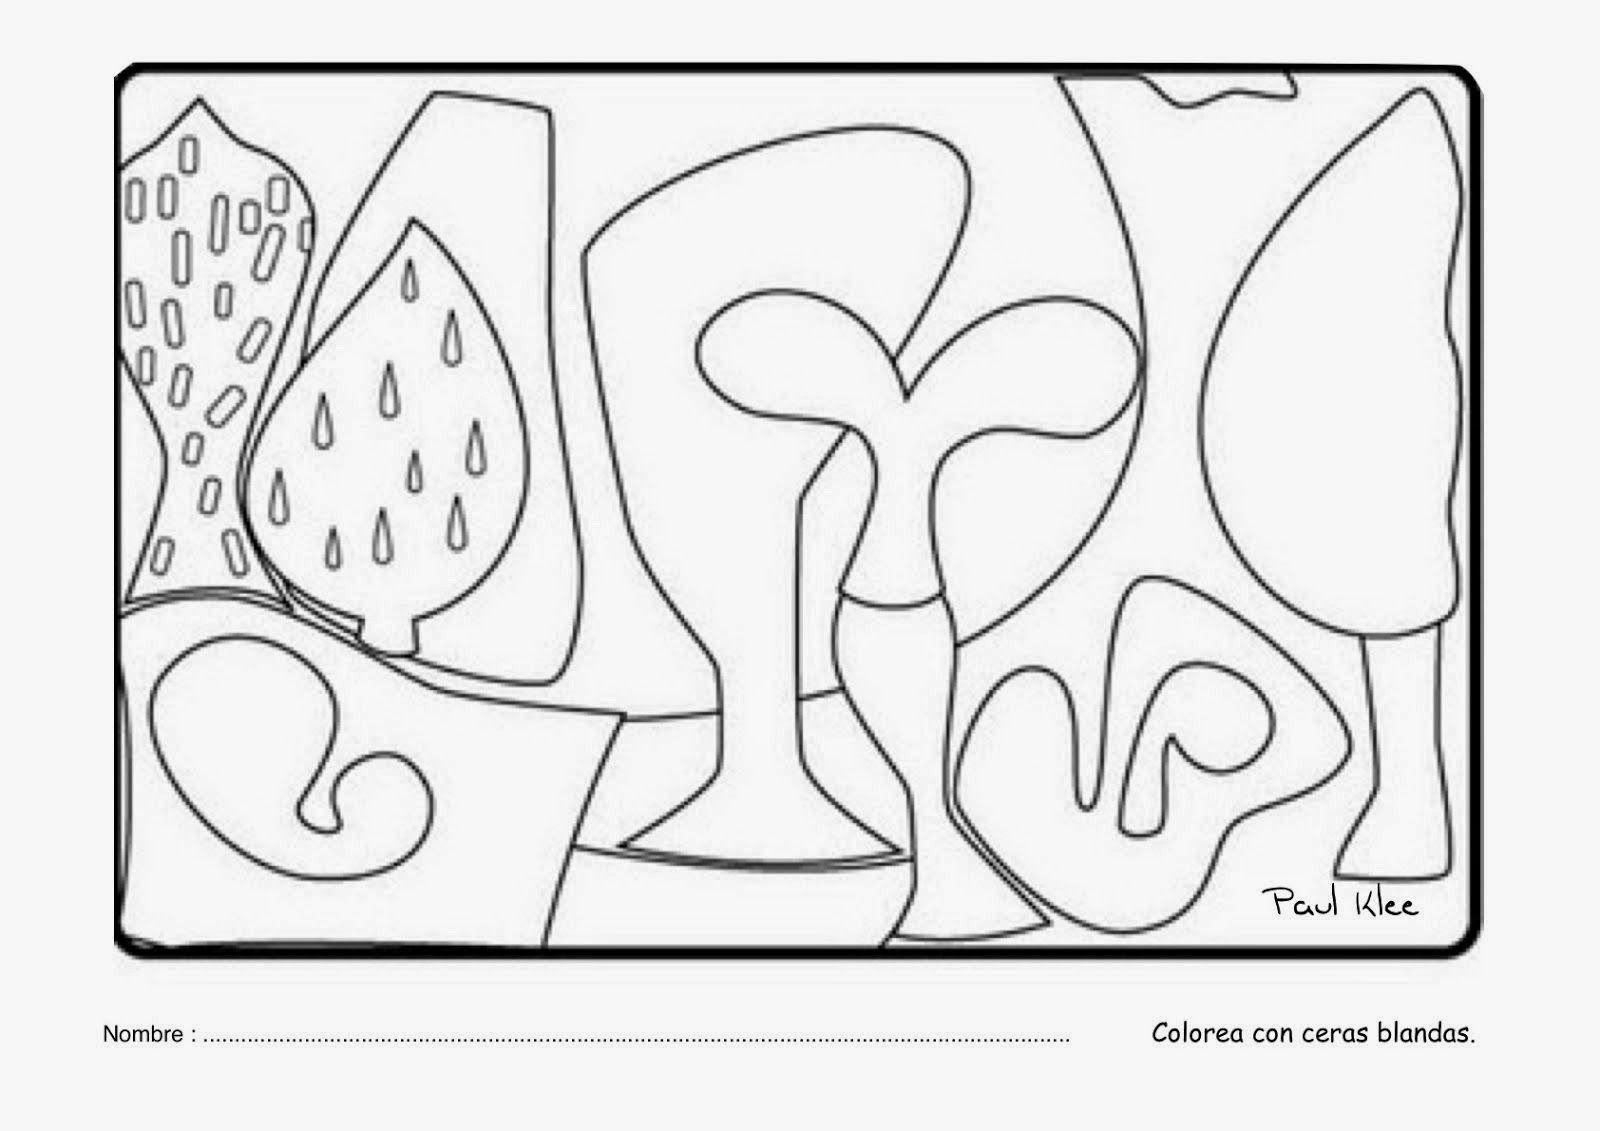 Pintores famosos: Paul Klee para niños | Art | Pinterest | Paul klee ...